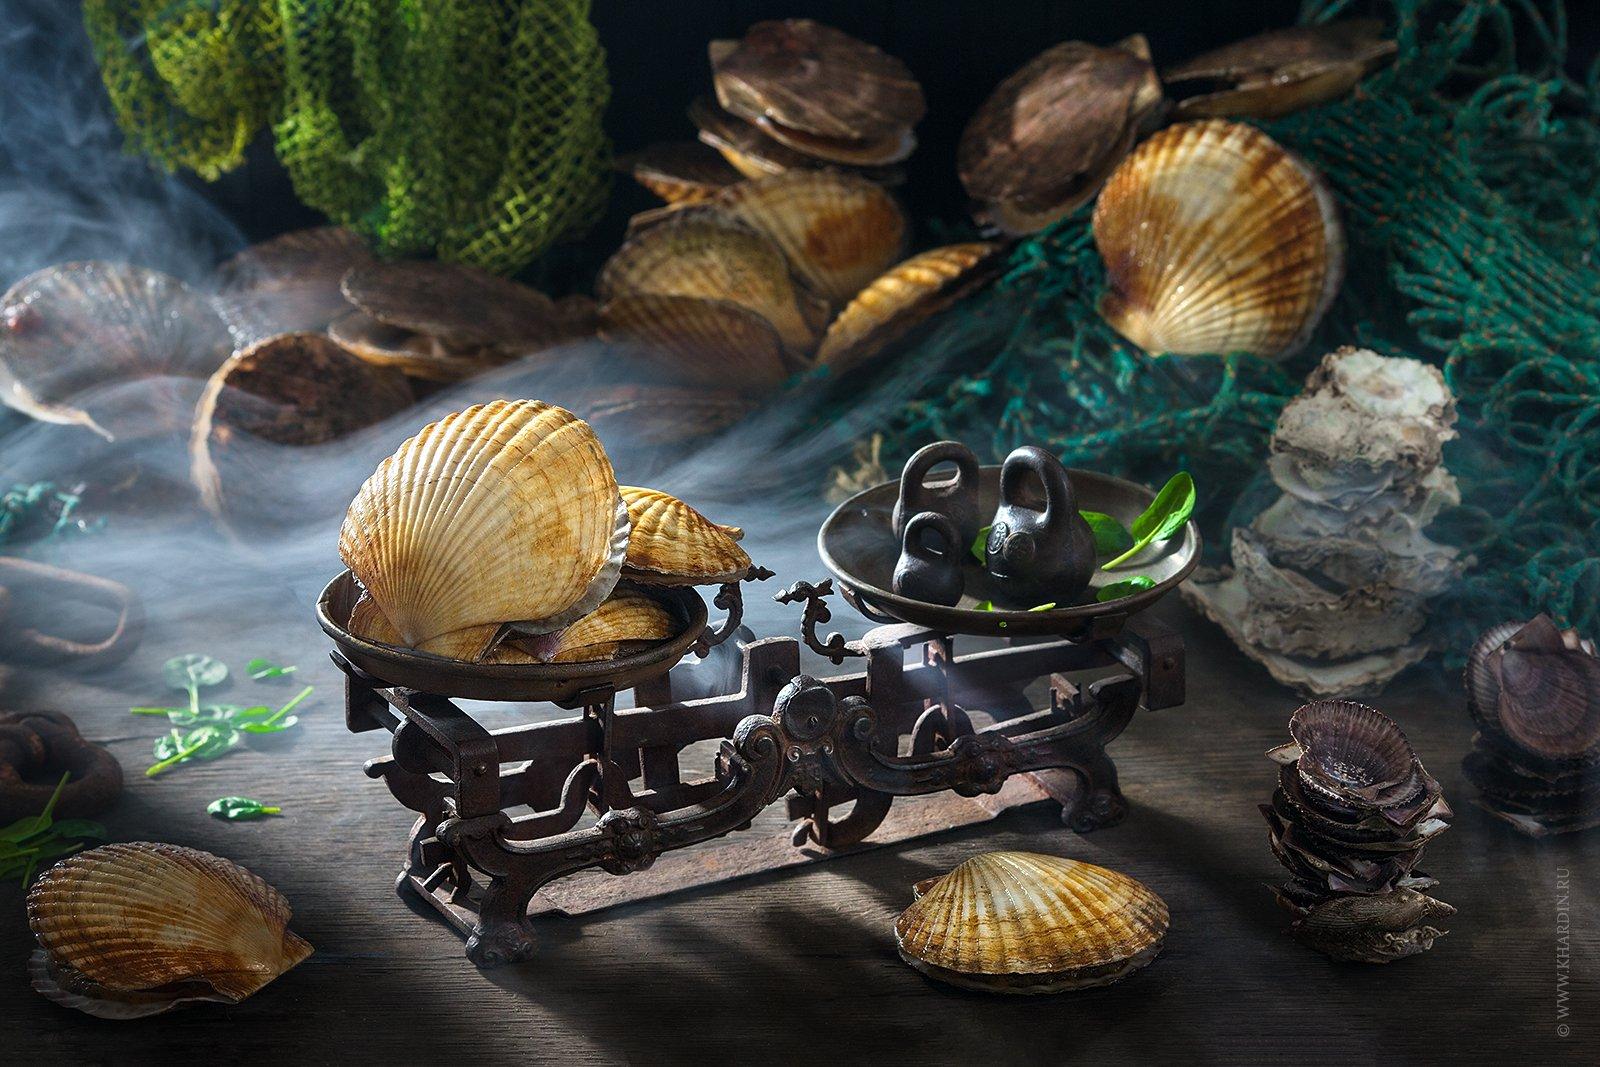 sea, japan, scallop, shellfish, гребешок, потерянное детство, россия, море, Khardin Alexander